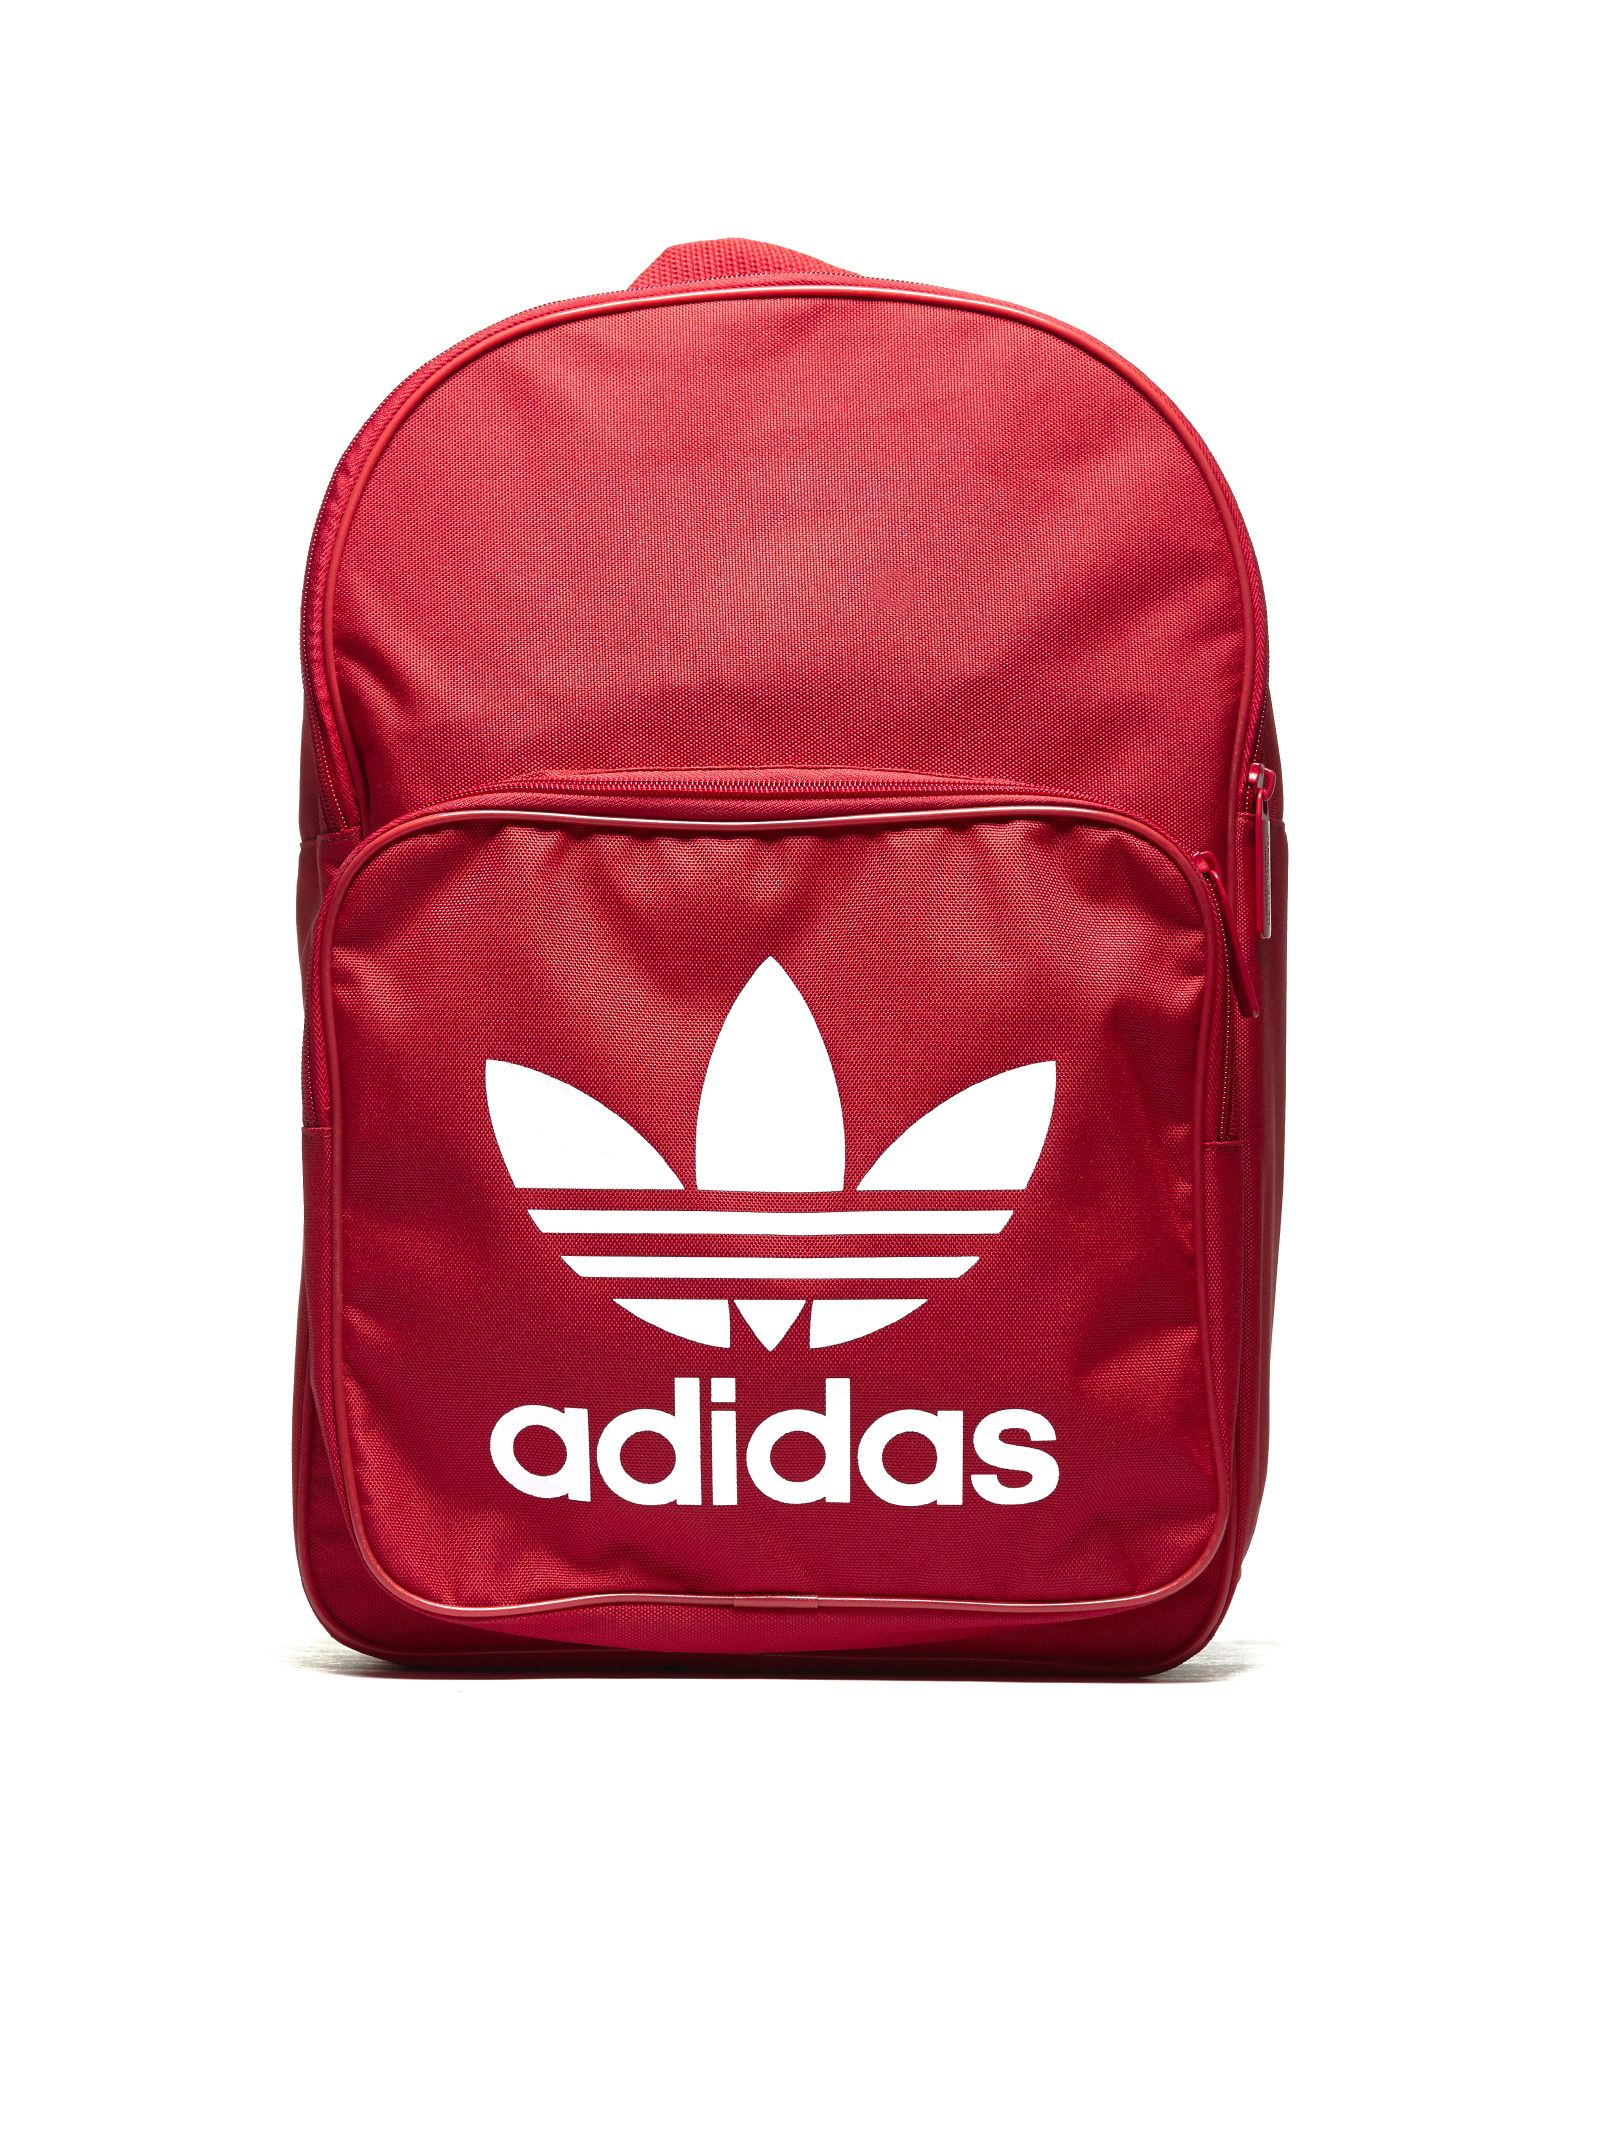 012ba6cb32 Adidas Originals Classic Trefoil Backpack In Rosso